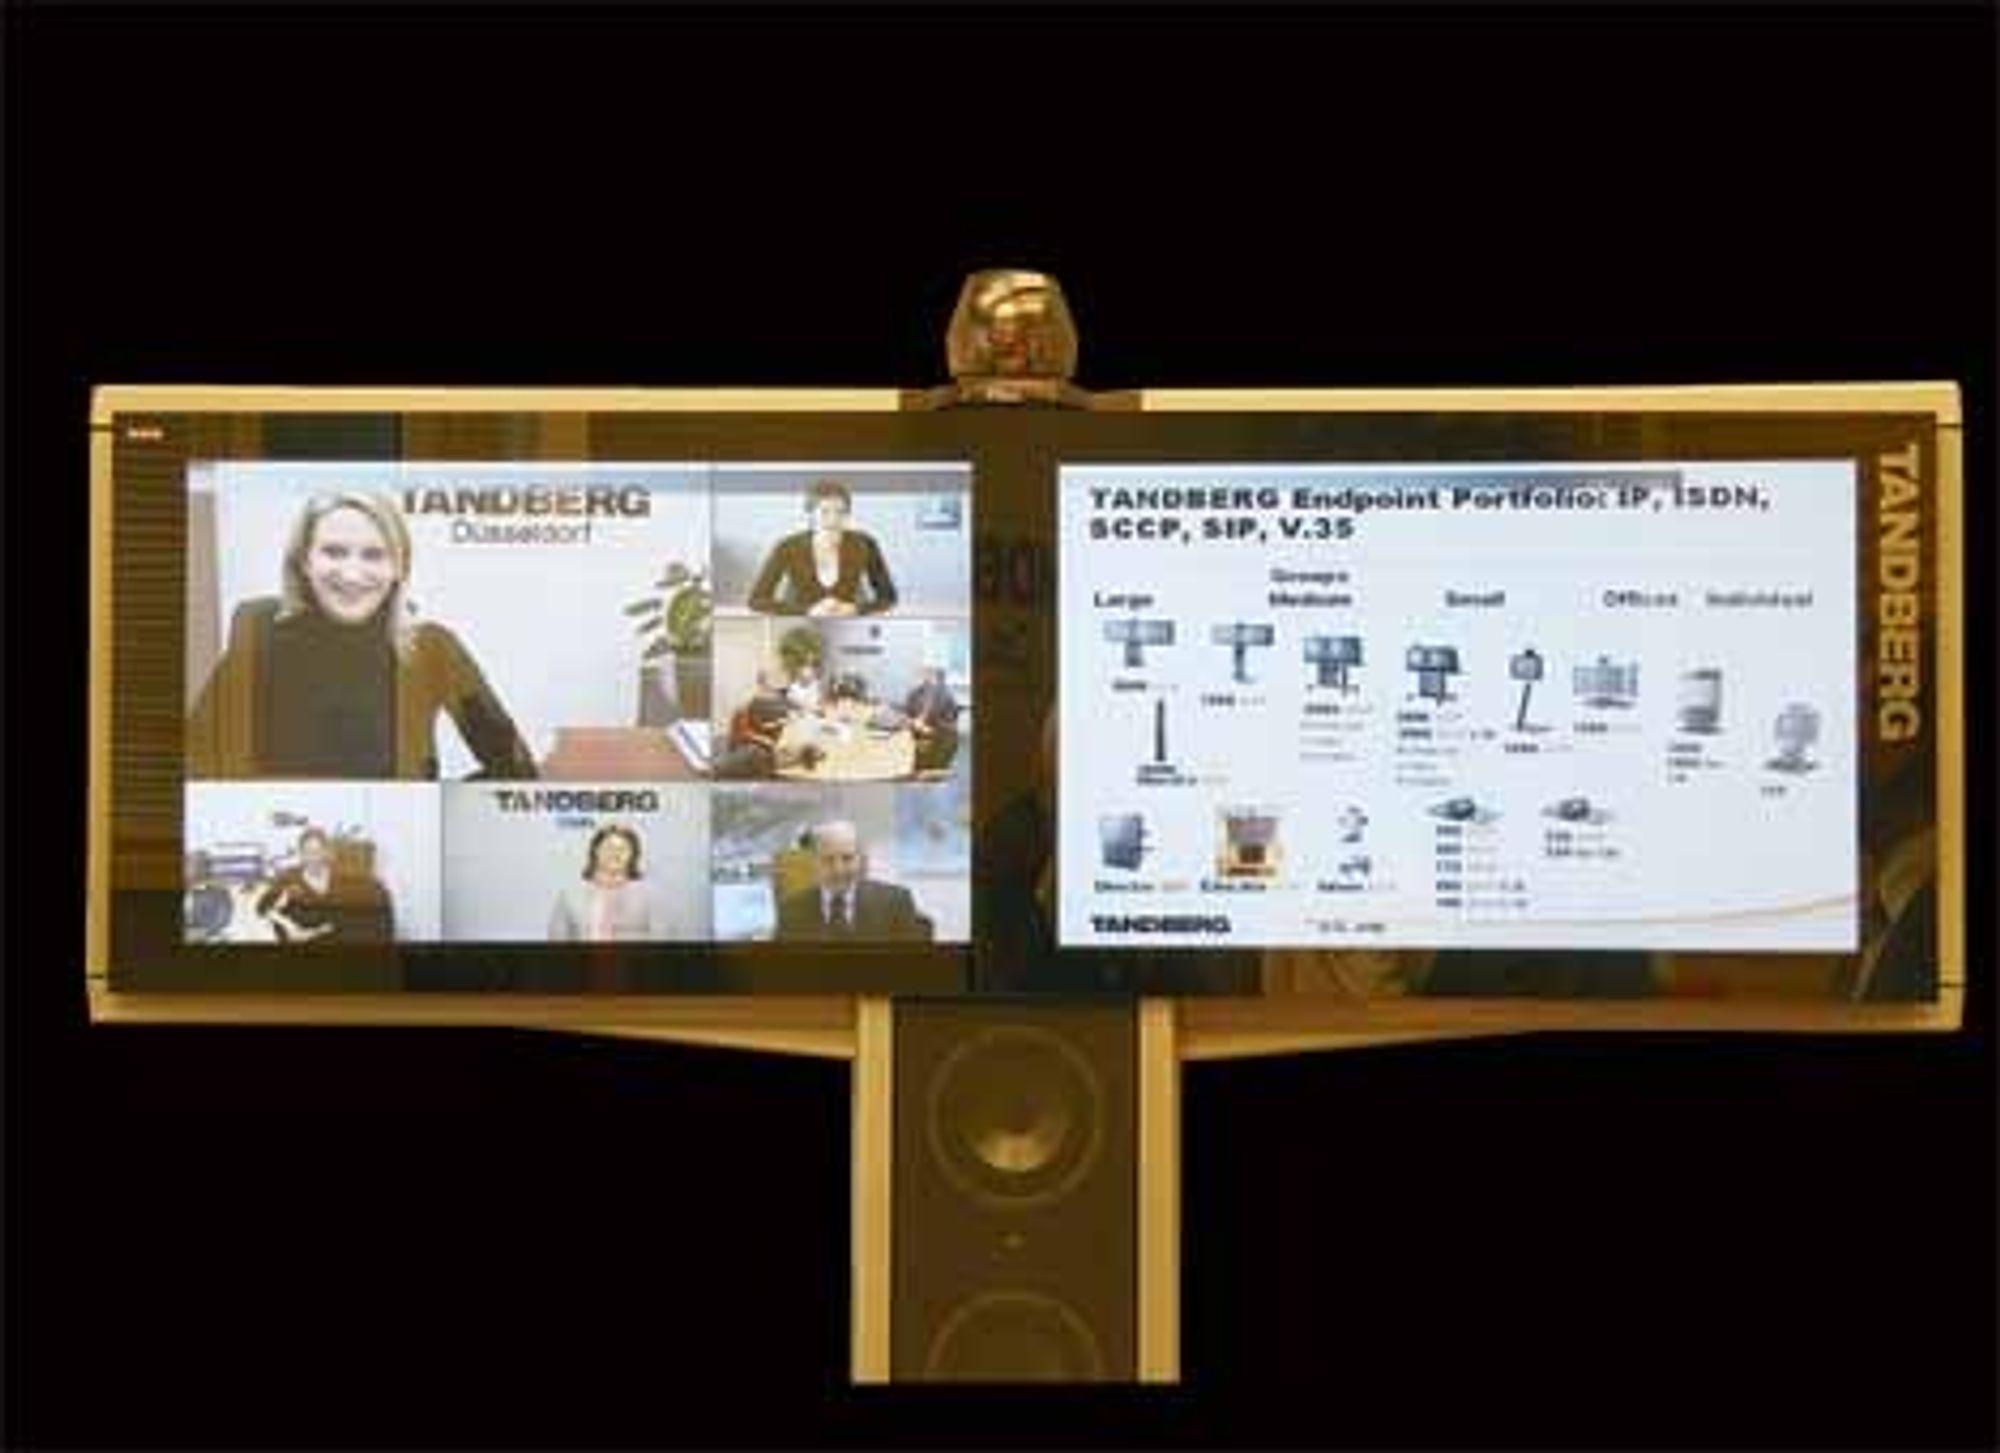 SPARE. Videokonferanser kan spare skattekroner og miljøet.